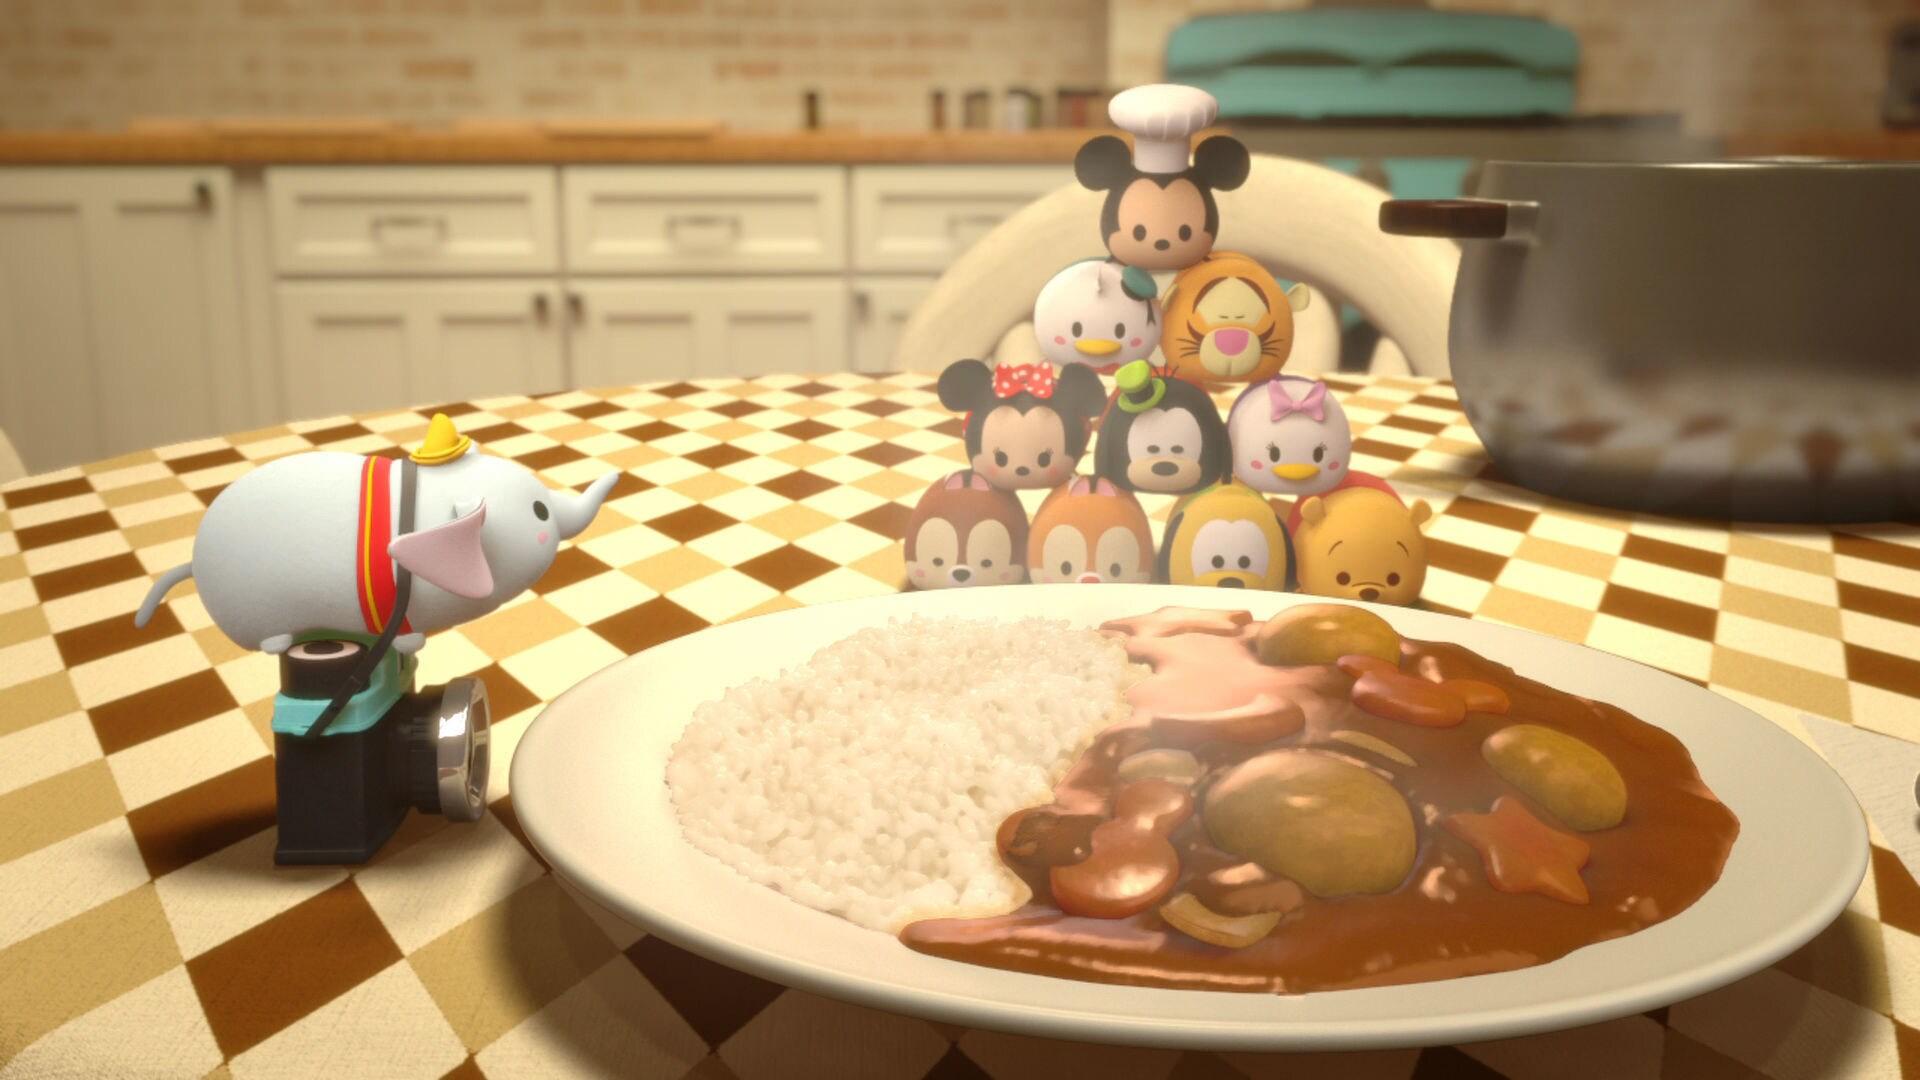 Tsum Tsum Cooking